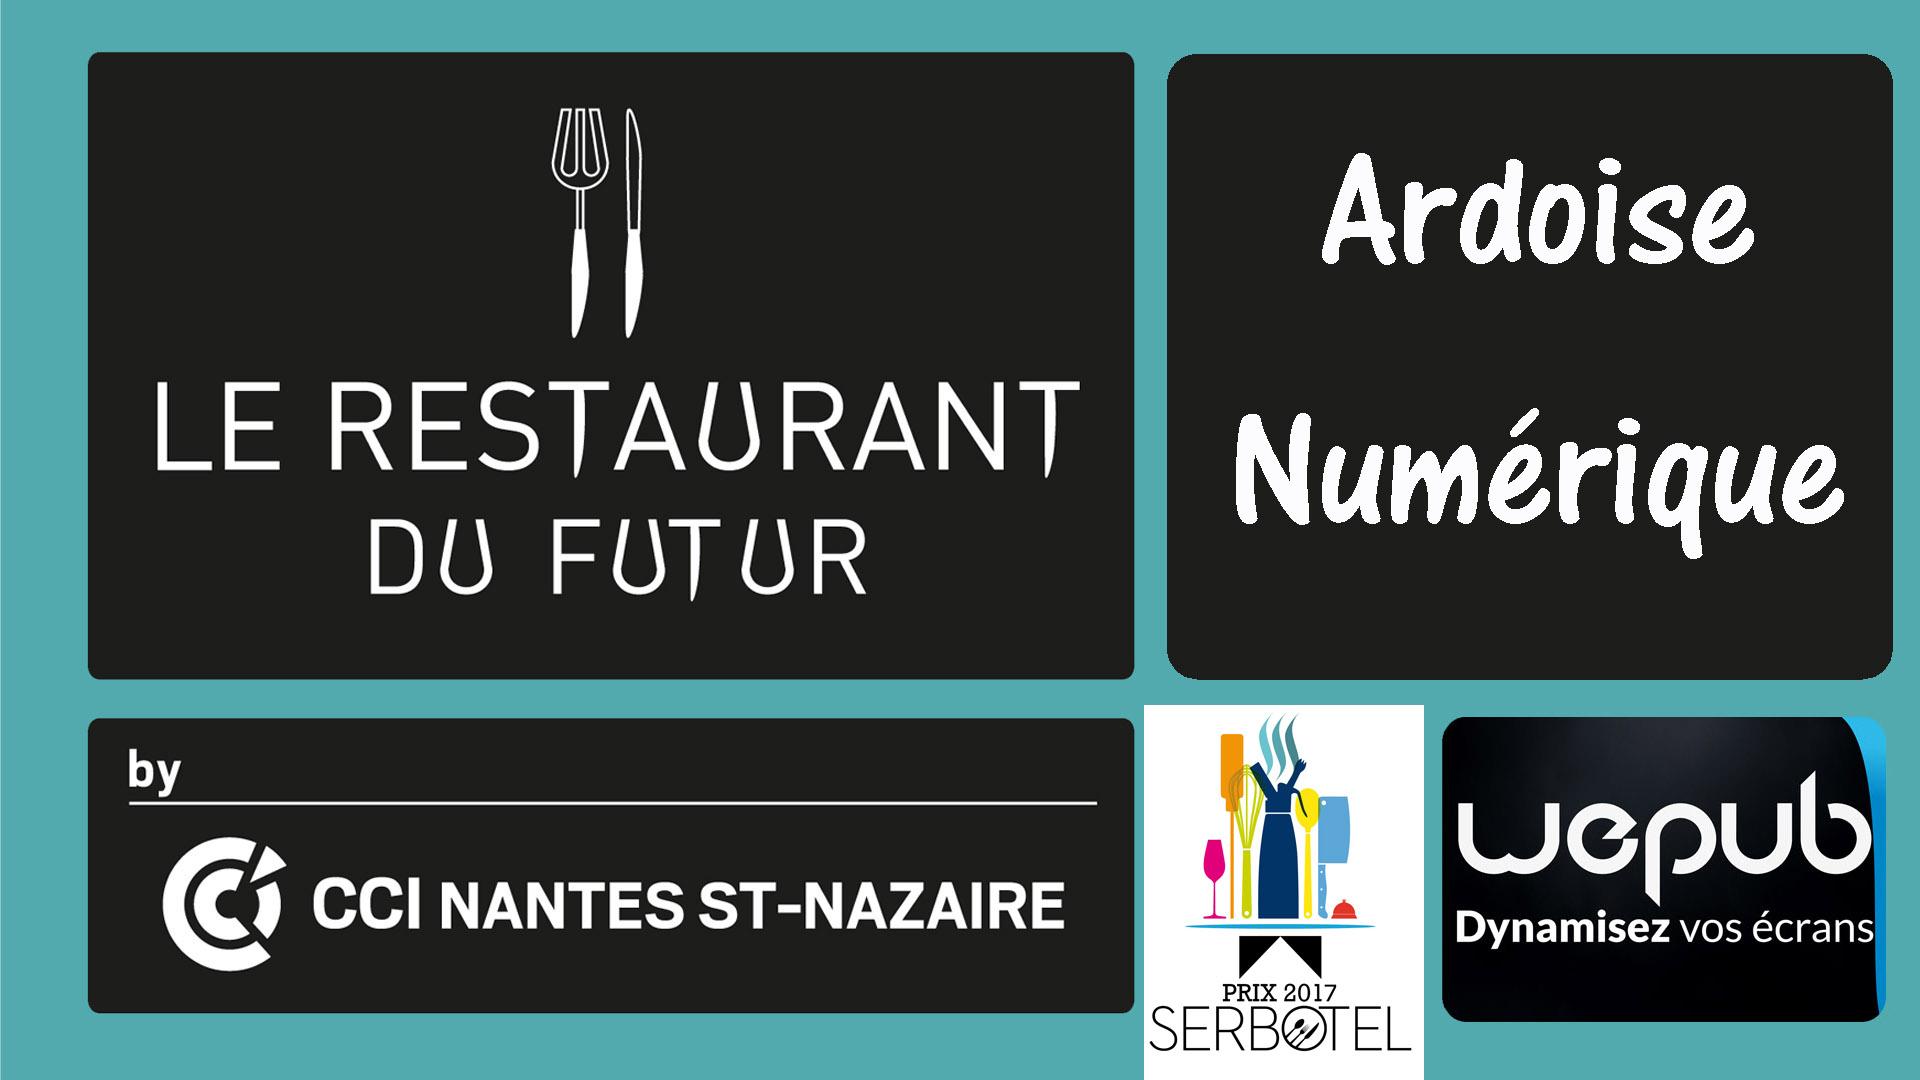 animation serbotel 2017 Restaurant du futur